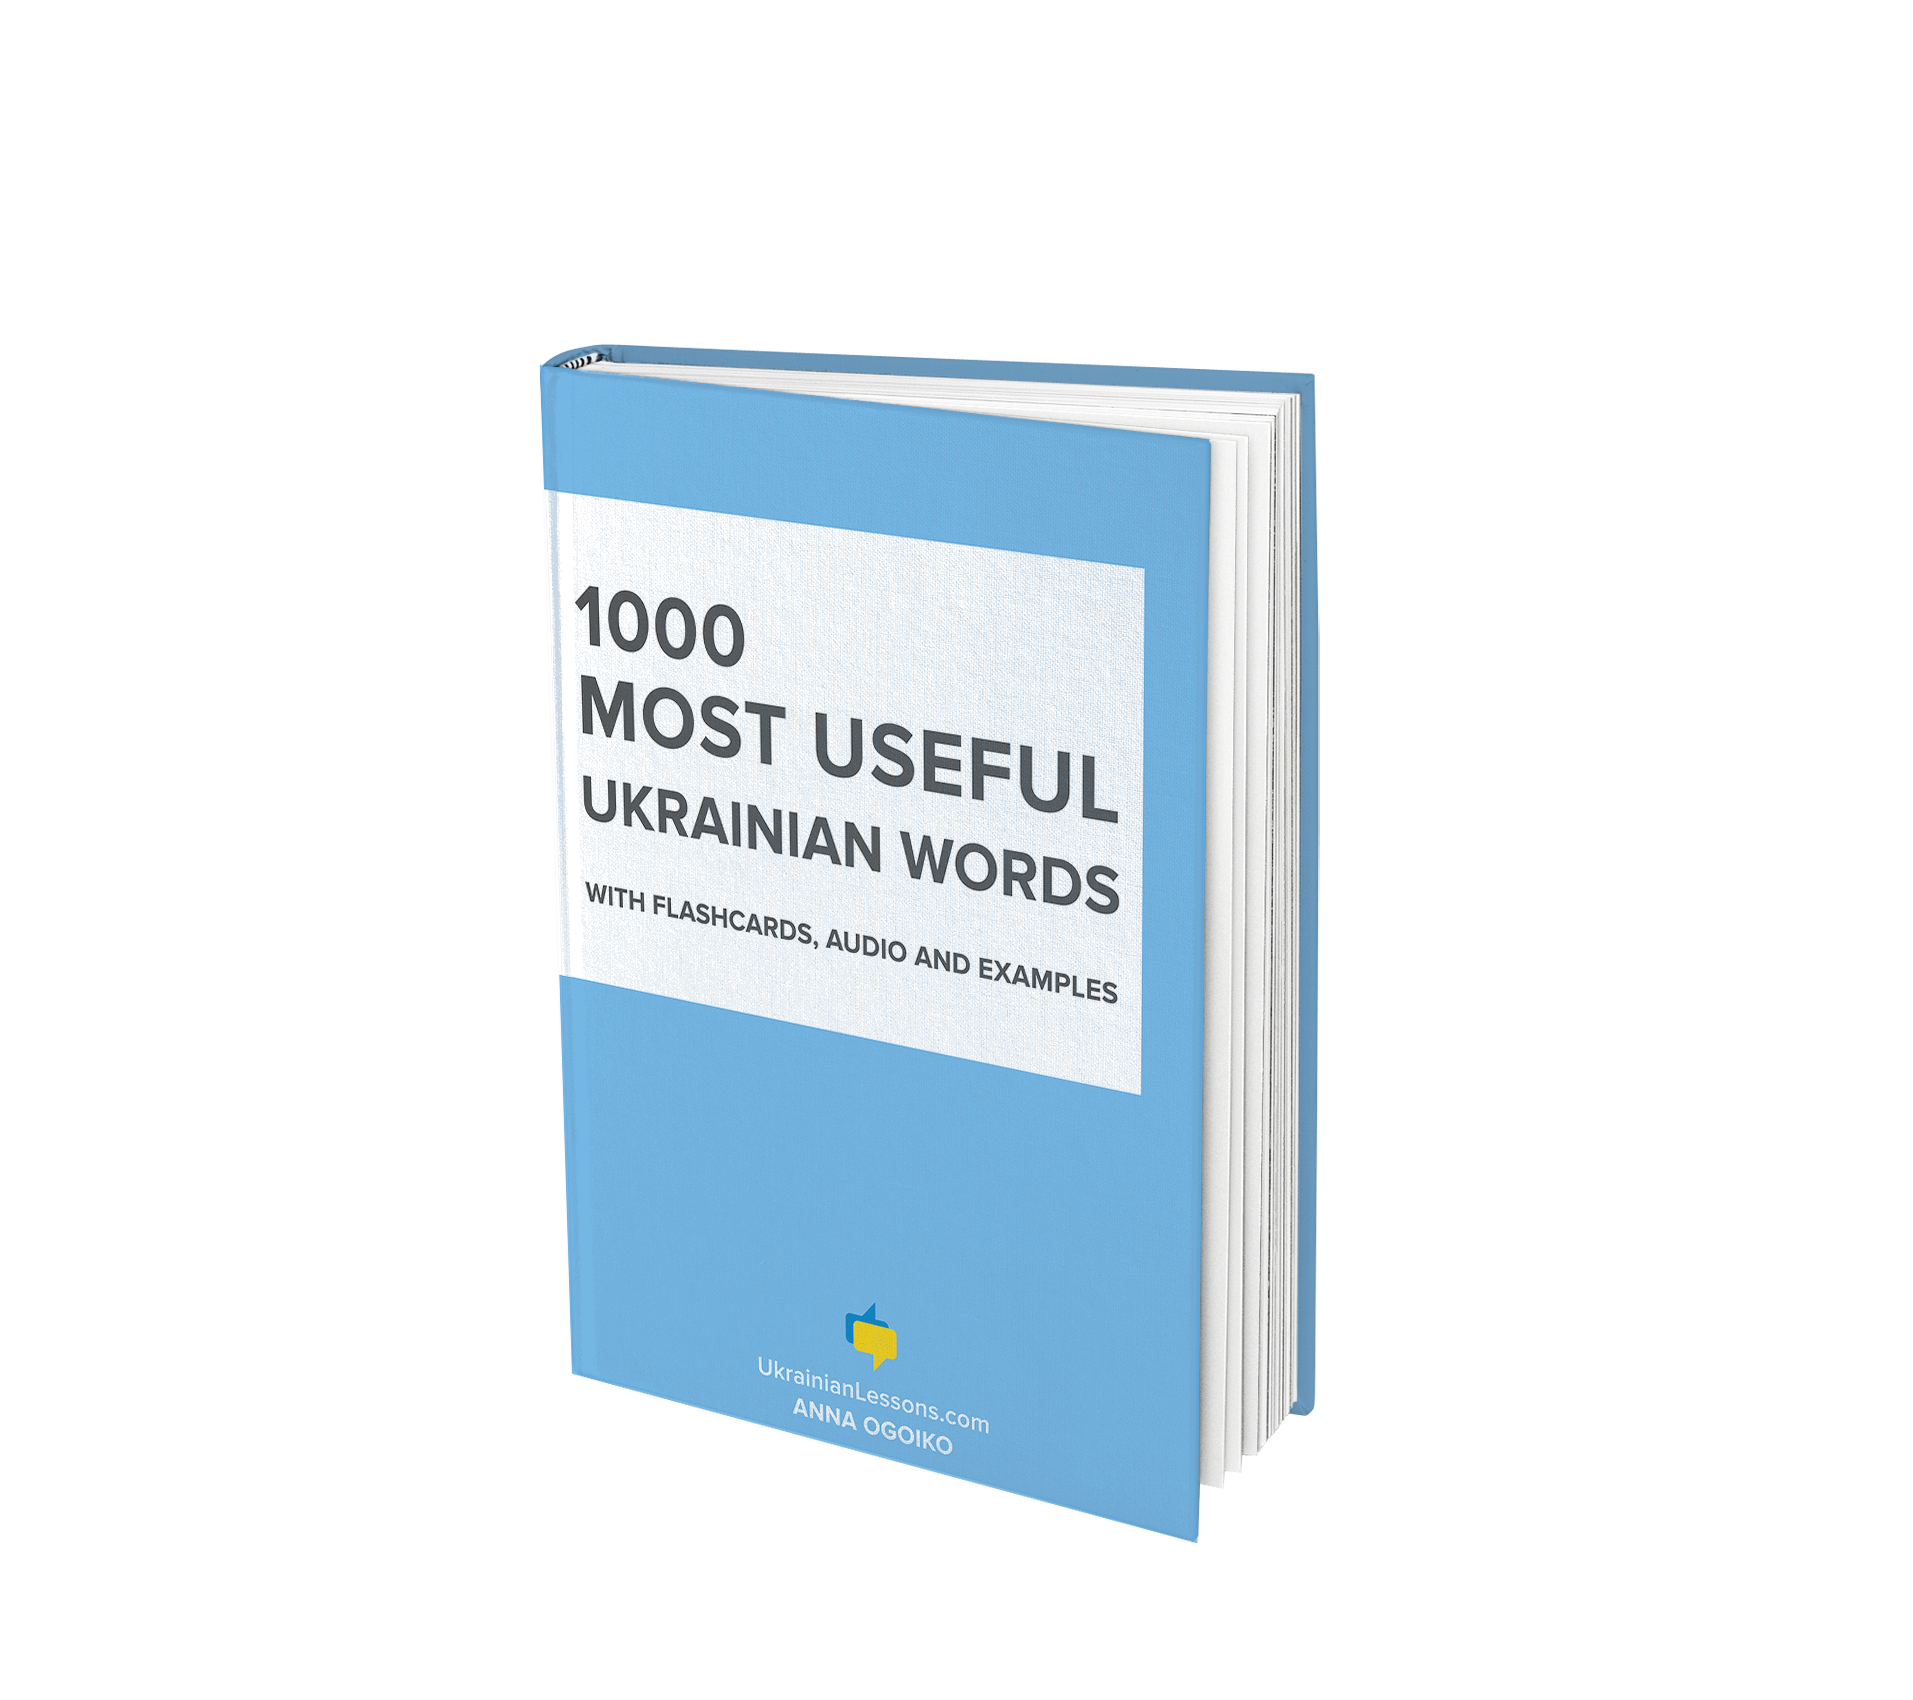 1000 Most Useful Ukrainian Words - Ebook and Flashcards by Anna Ogoiko